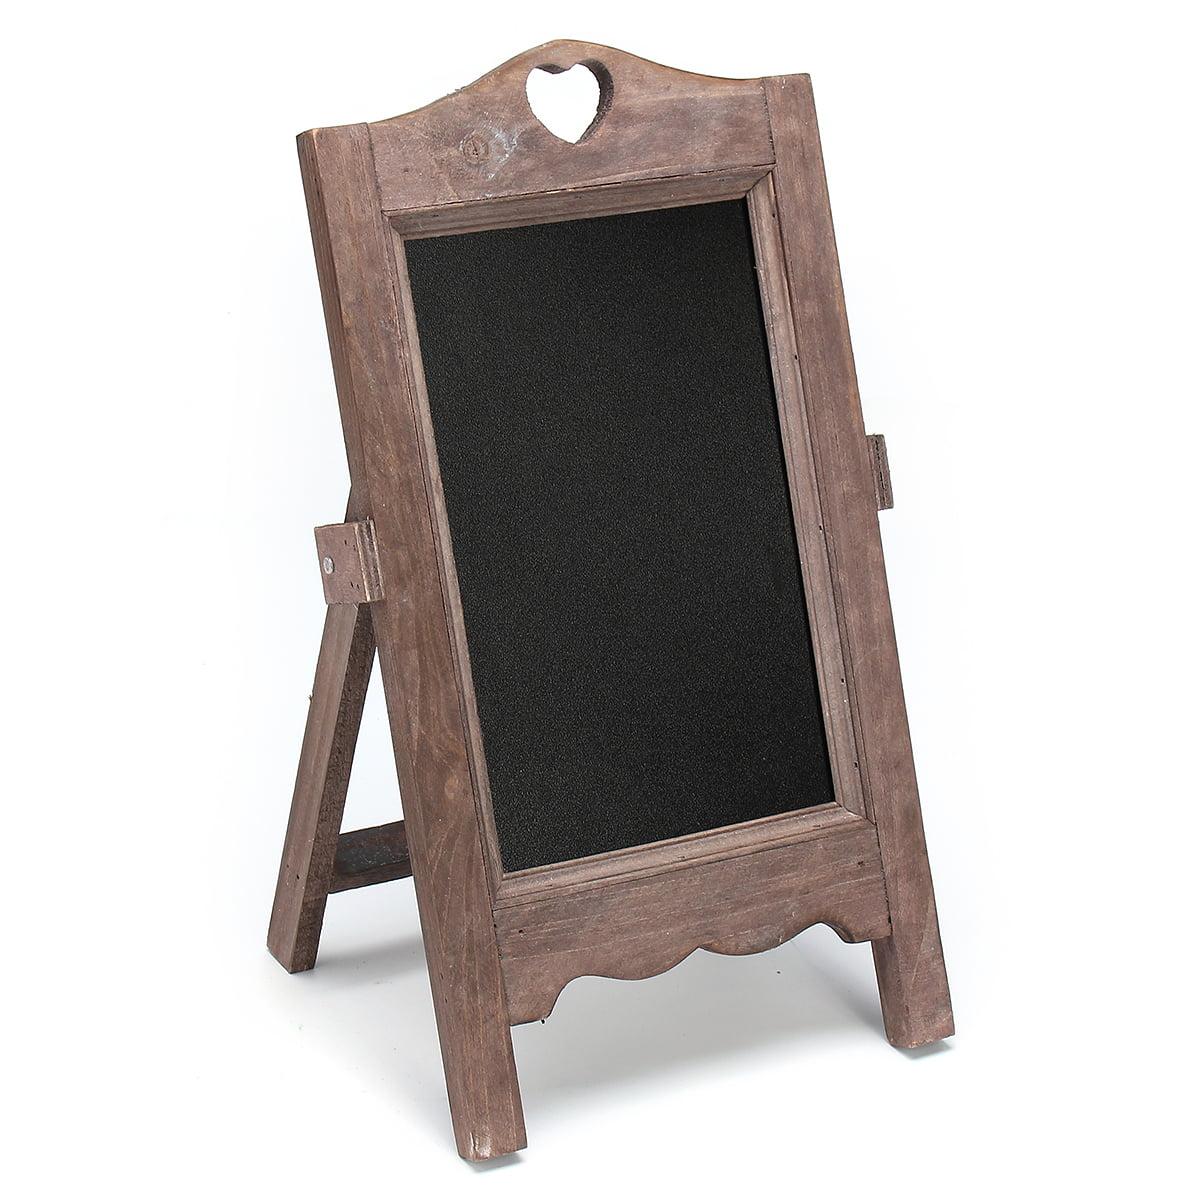 "4.9 x 7.7 x 13.8"" Vintage Wood Chalk Board Blackboard Memo Message Wedding Kitchen Notes Signs"